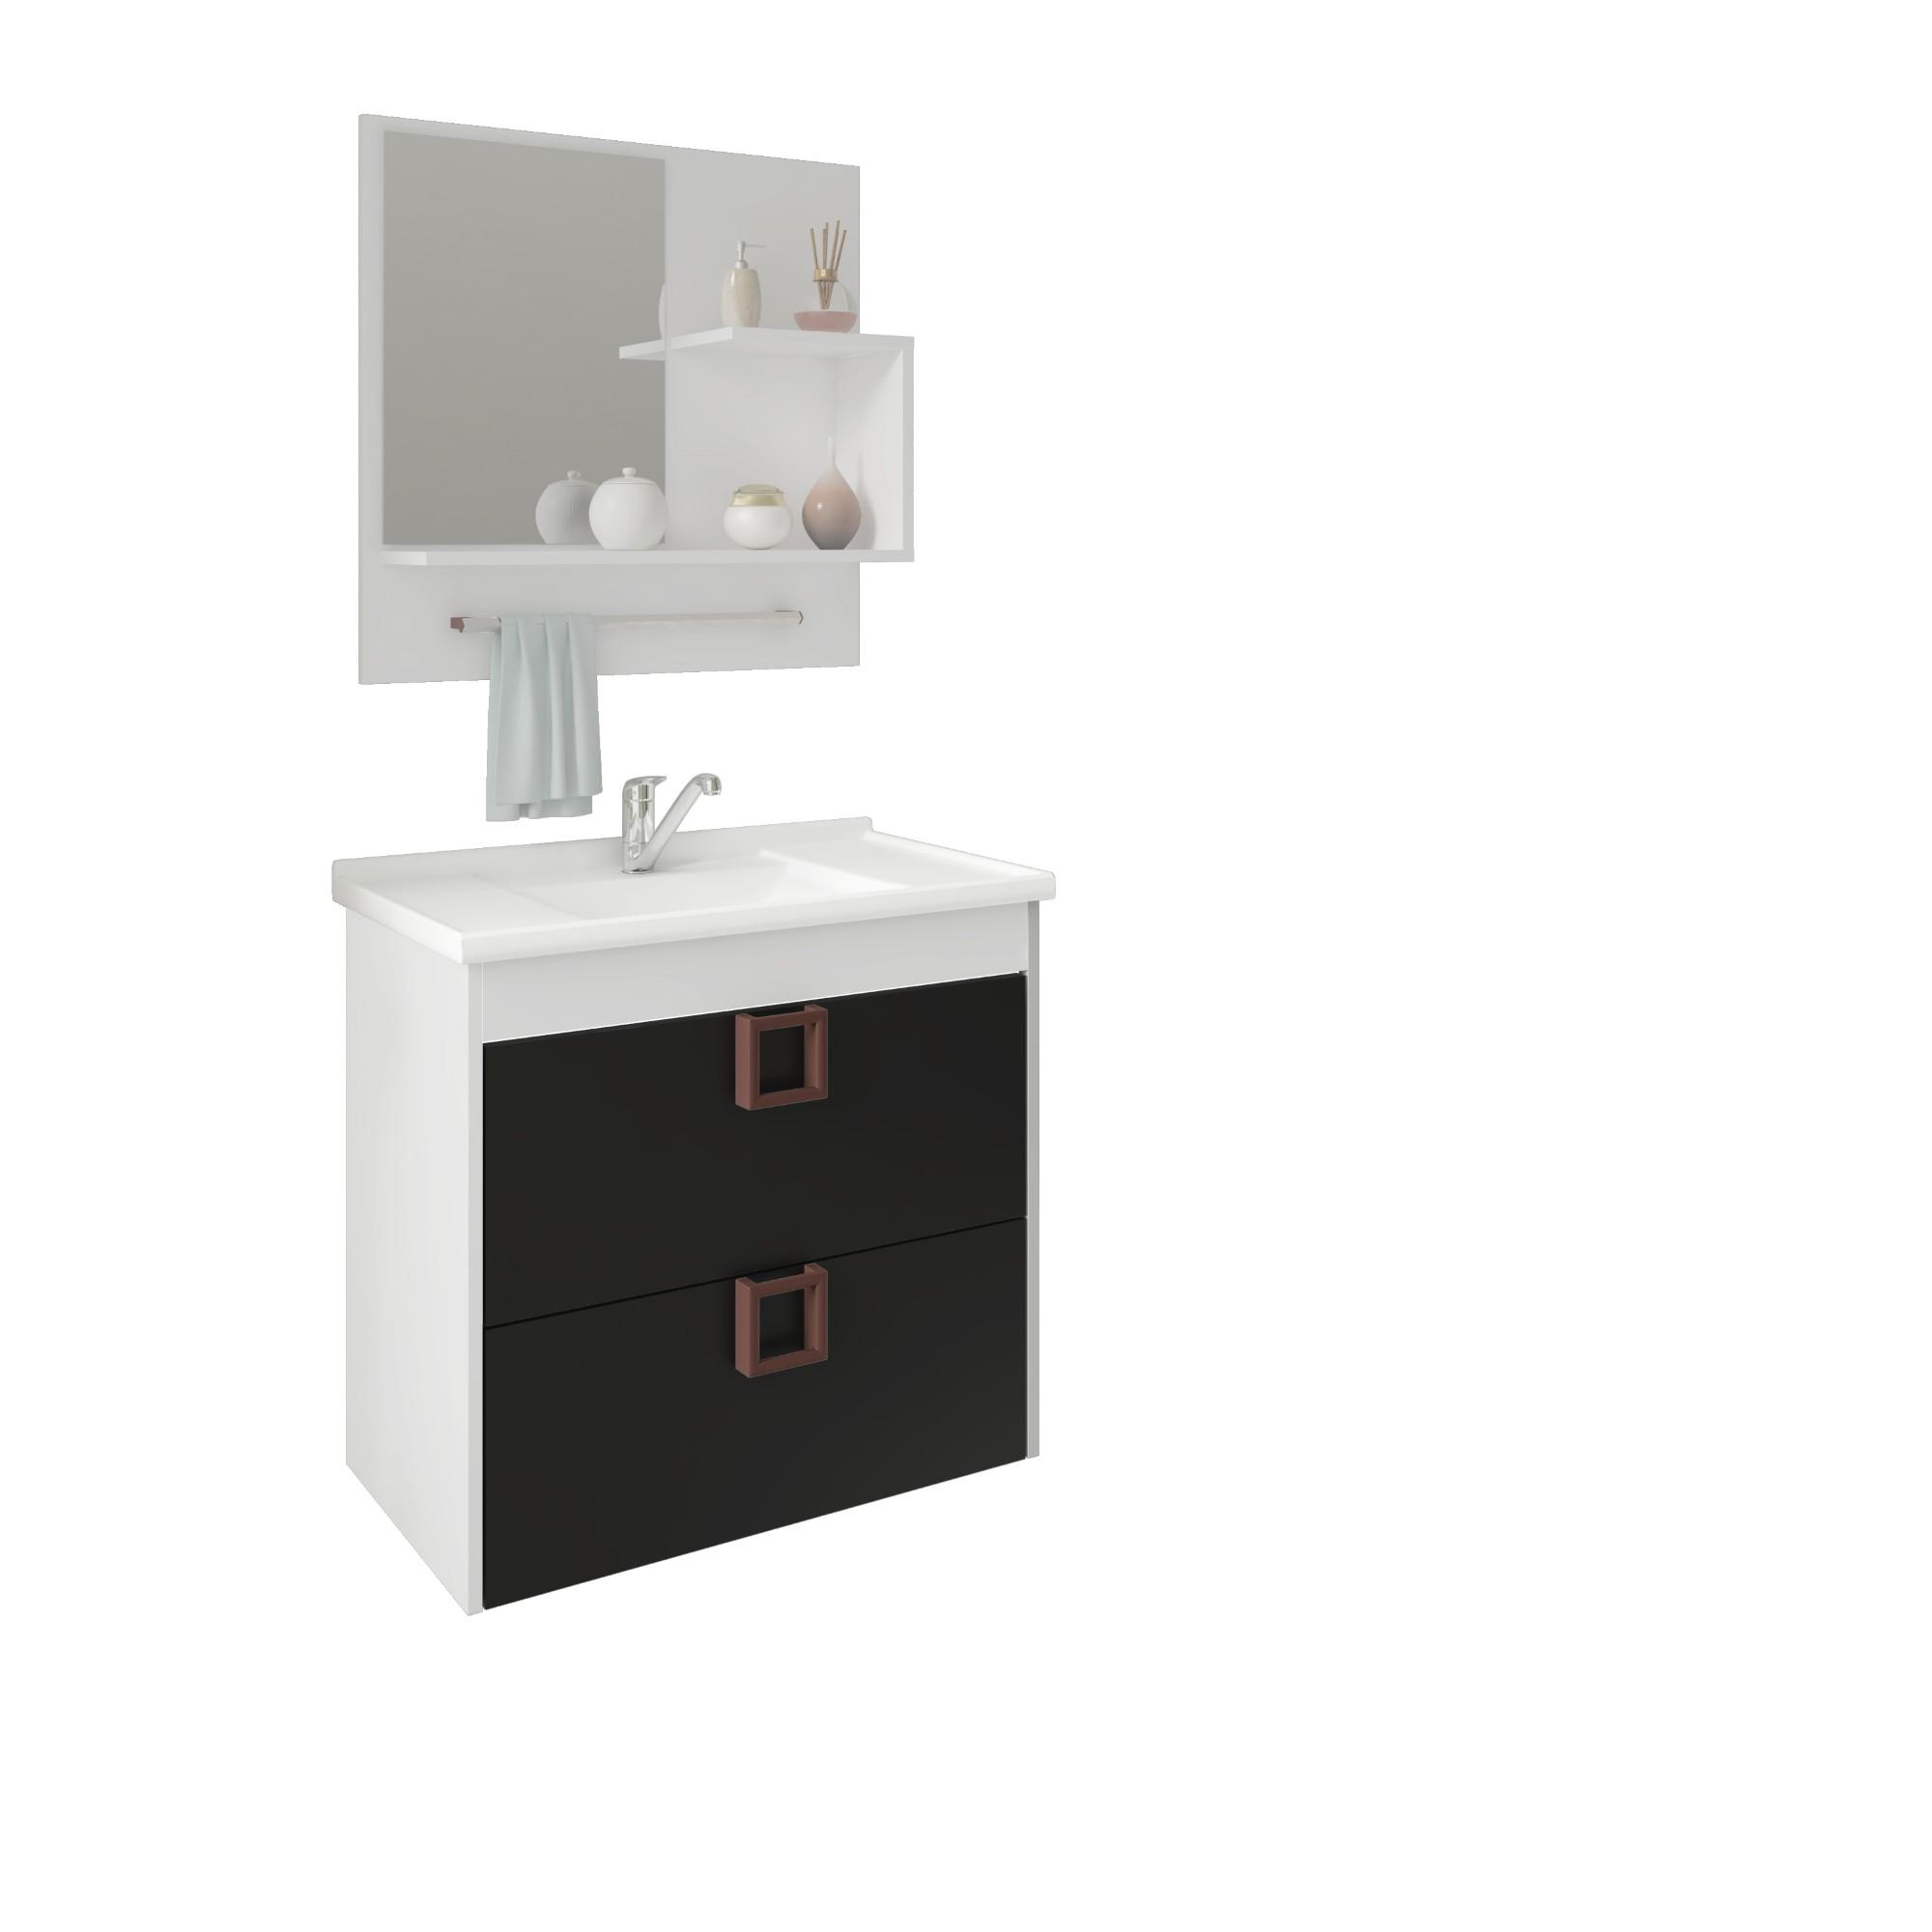 Gabinete para Banheiro 575x59x40cm Lirio Preto - MGM Moveis